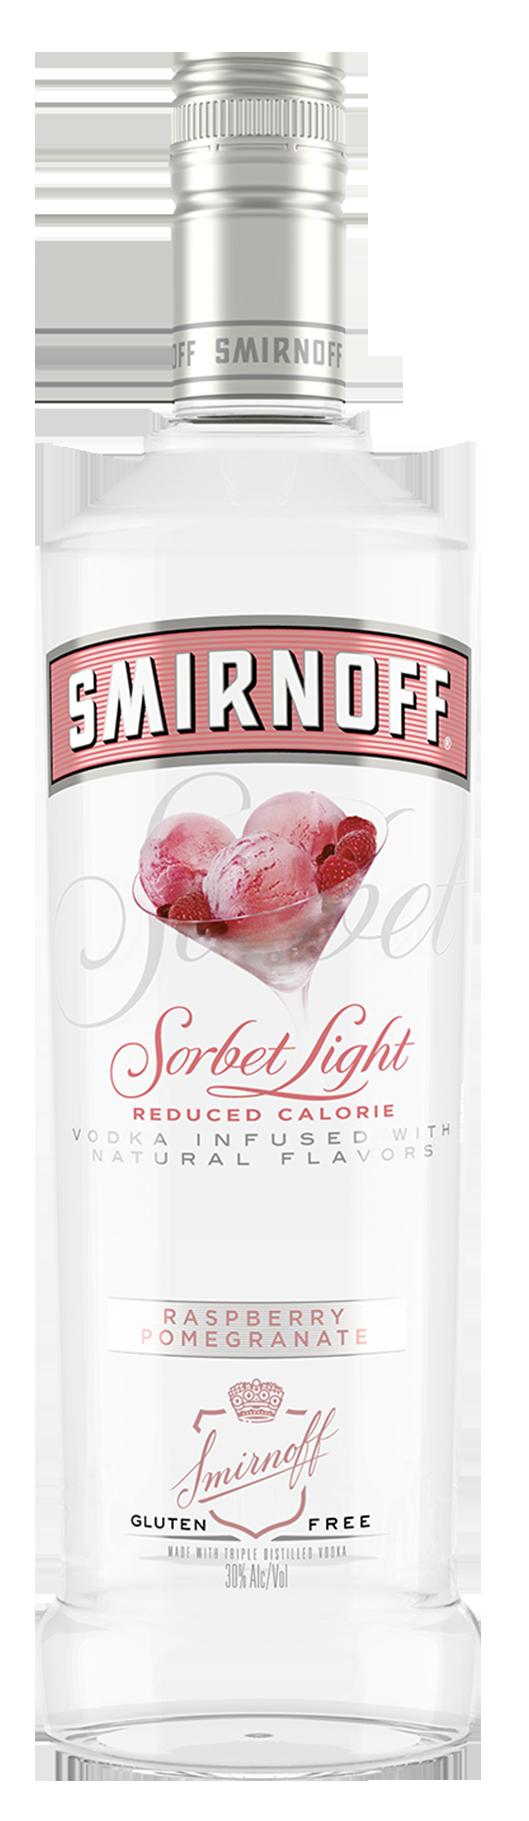 SMIRNOFF SORBET LIGHT RASPBERRY POMEGRANATE